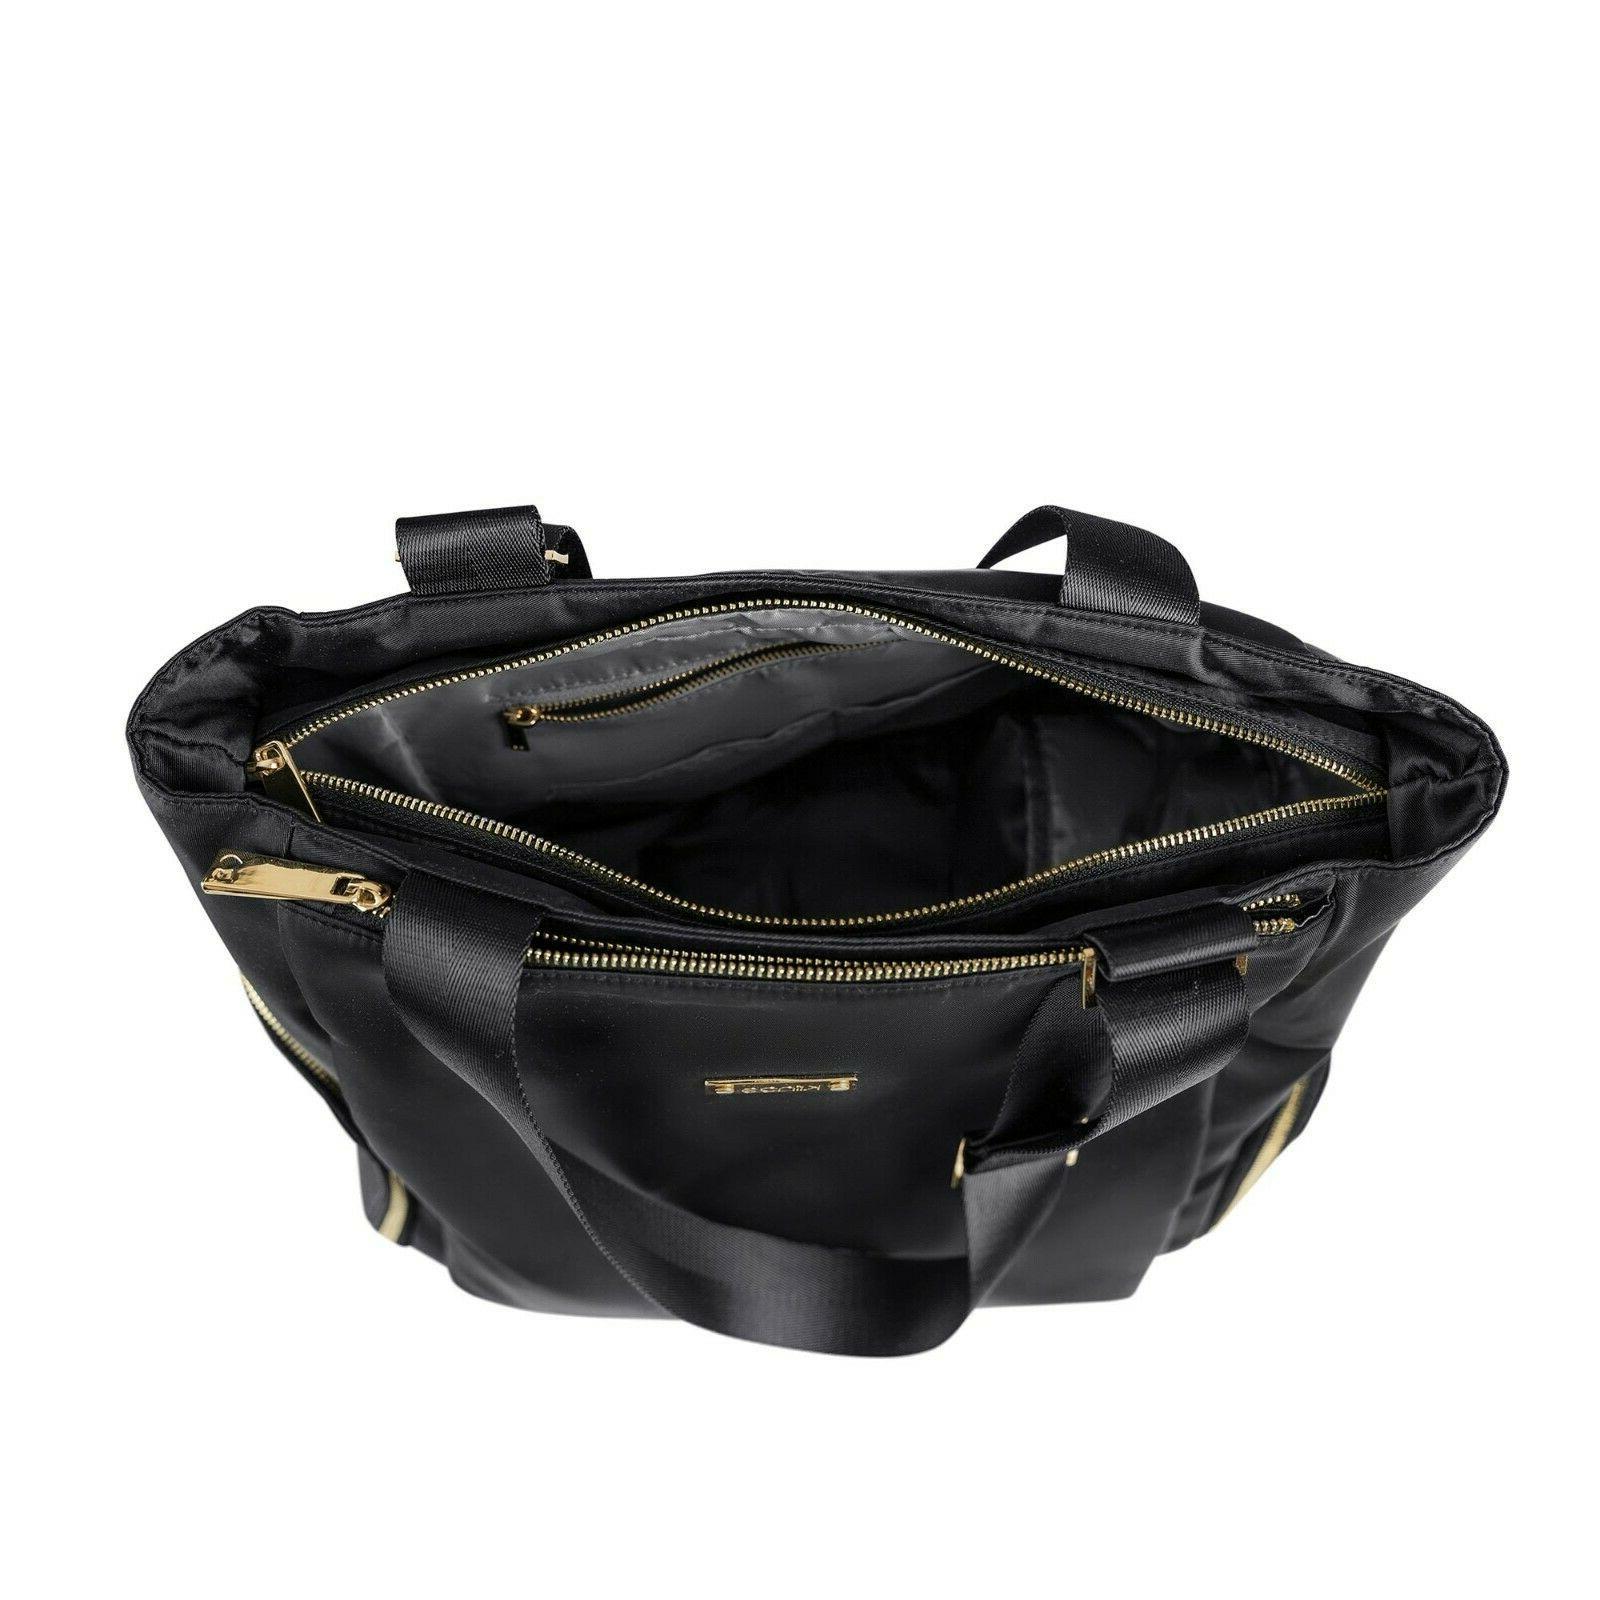 KIINDE EVERYDAY pump bag- STARTER KIT